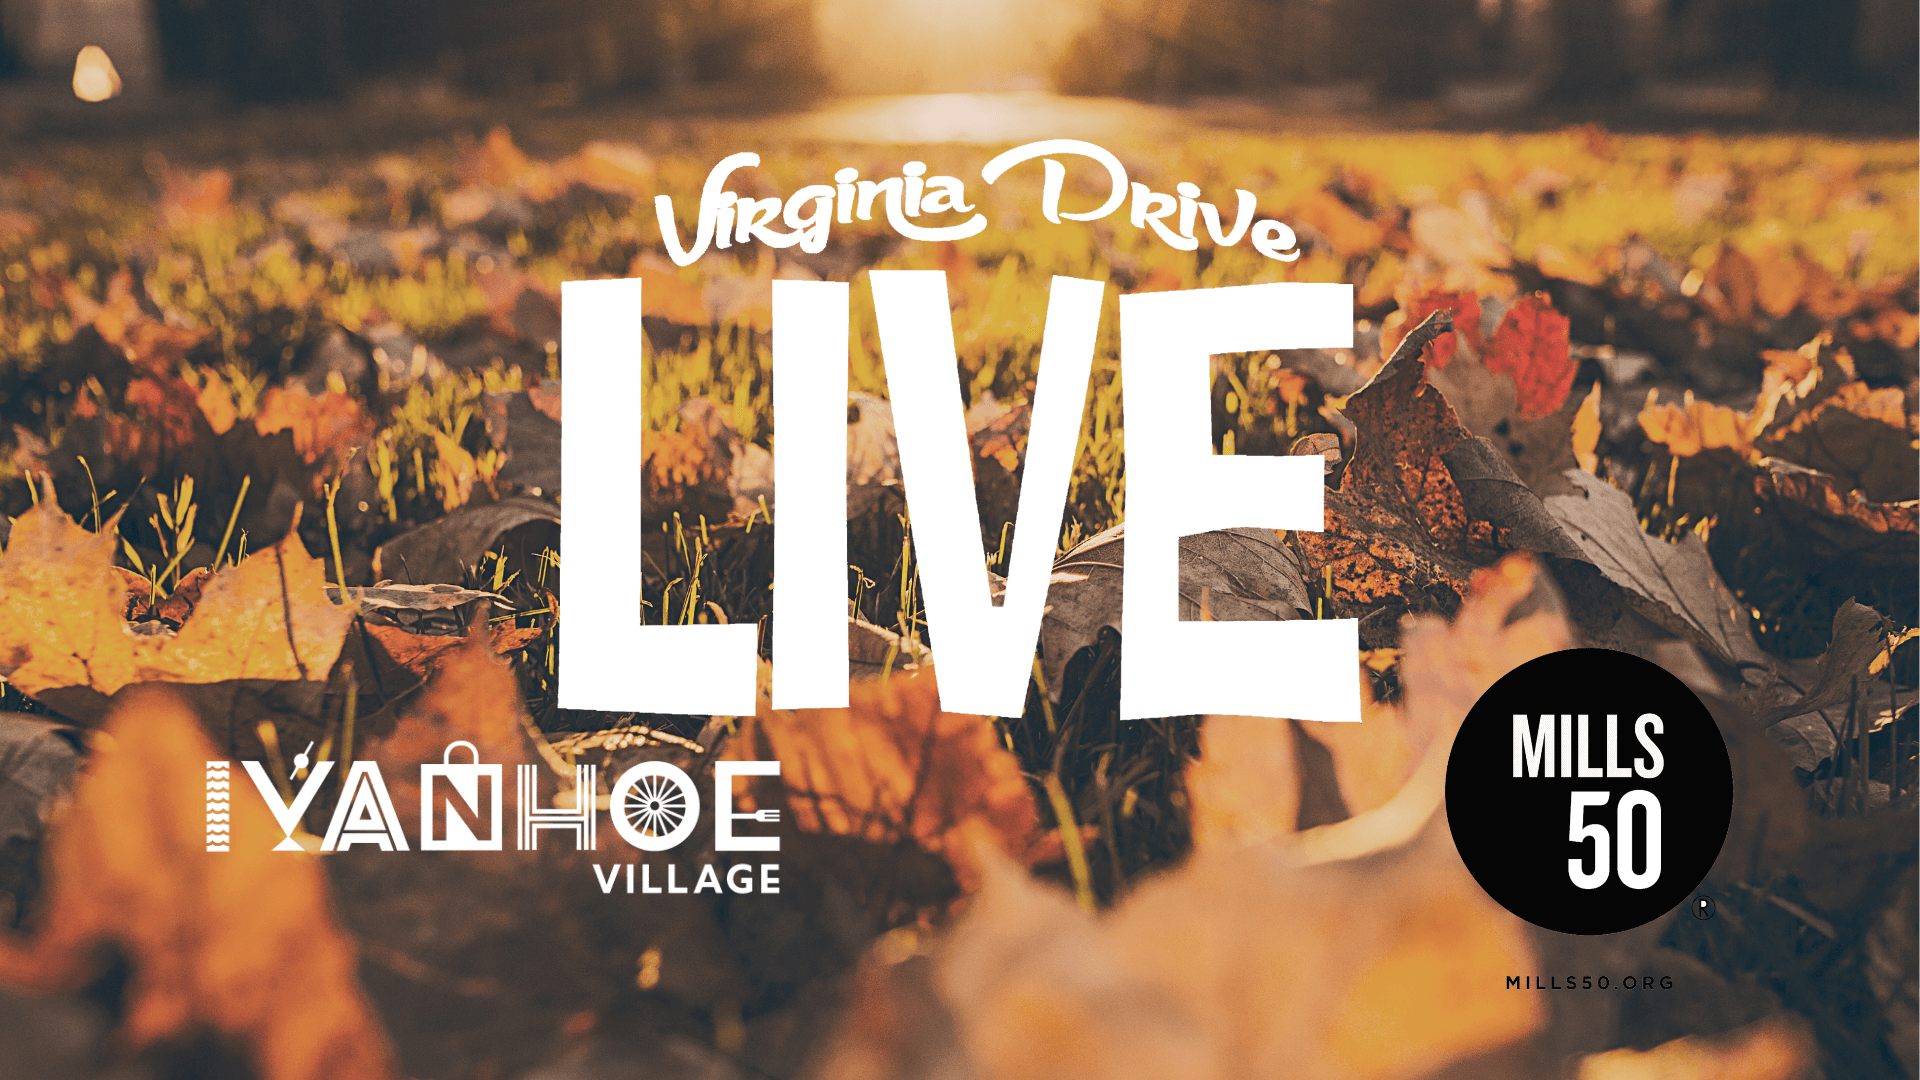 Virginia Drive Live! a community event in local Orlando